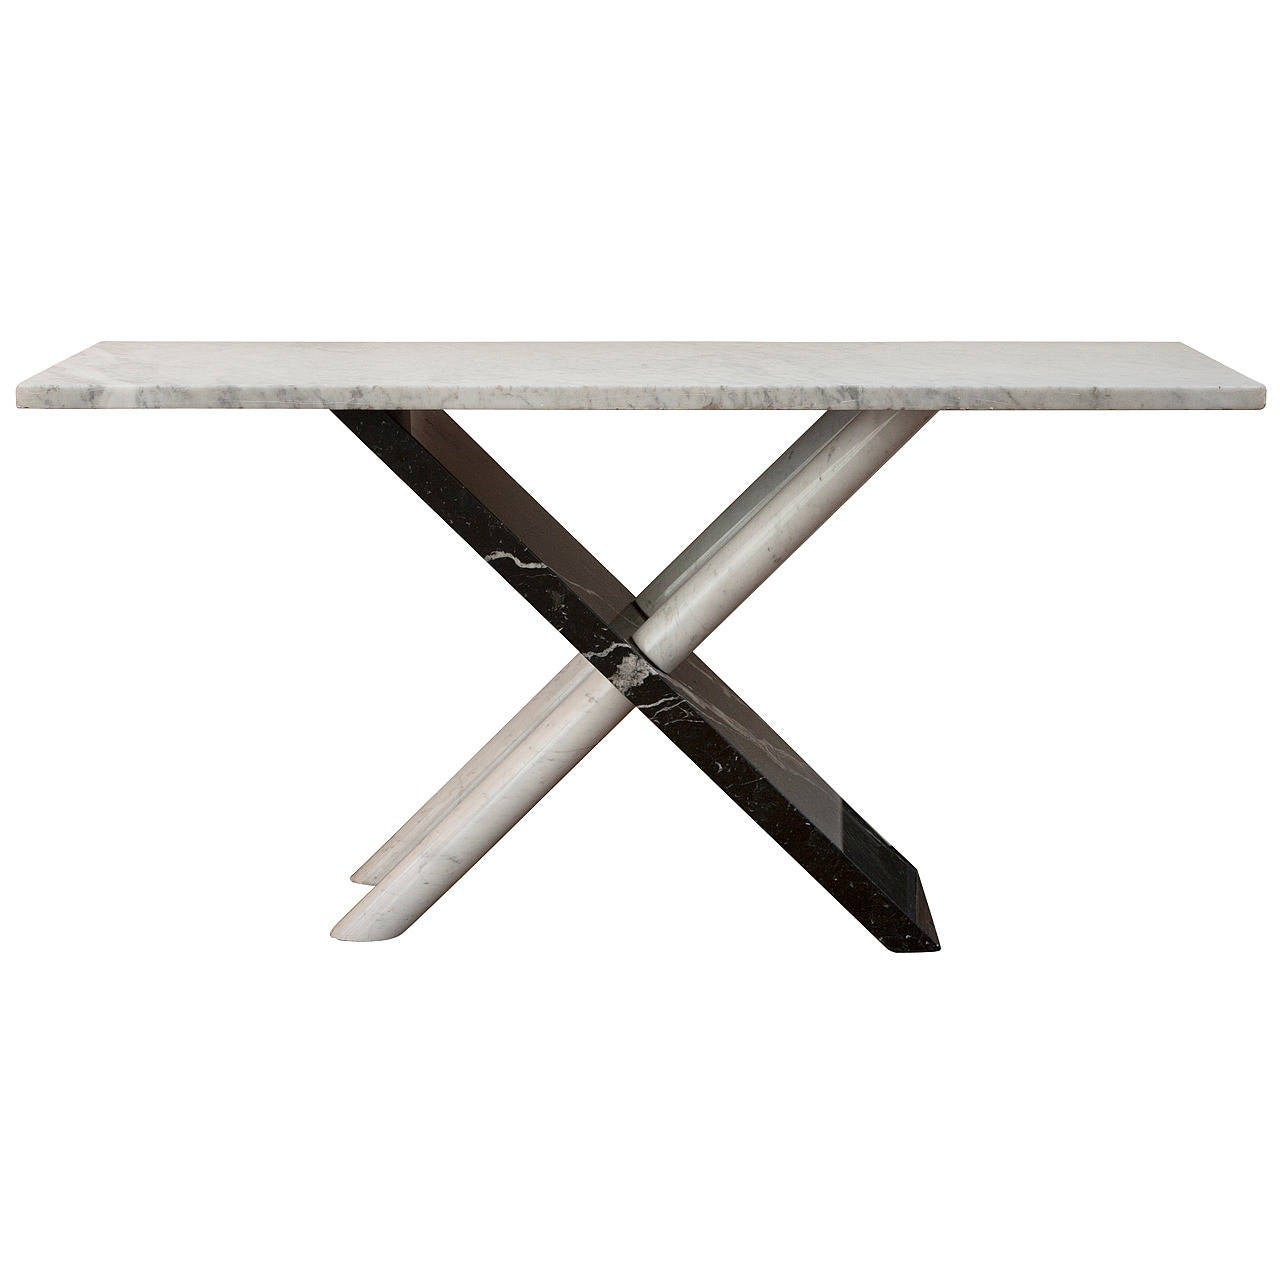 Italian marble console table, 1970s